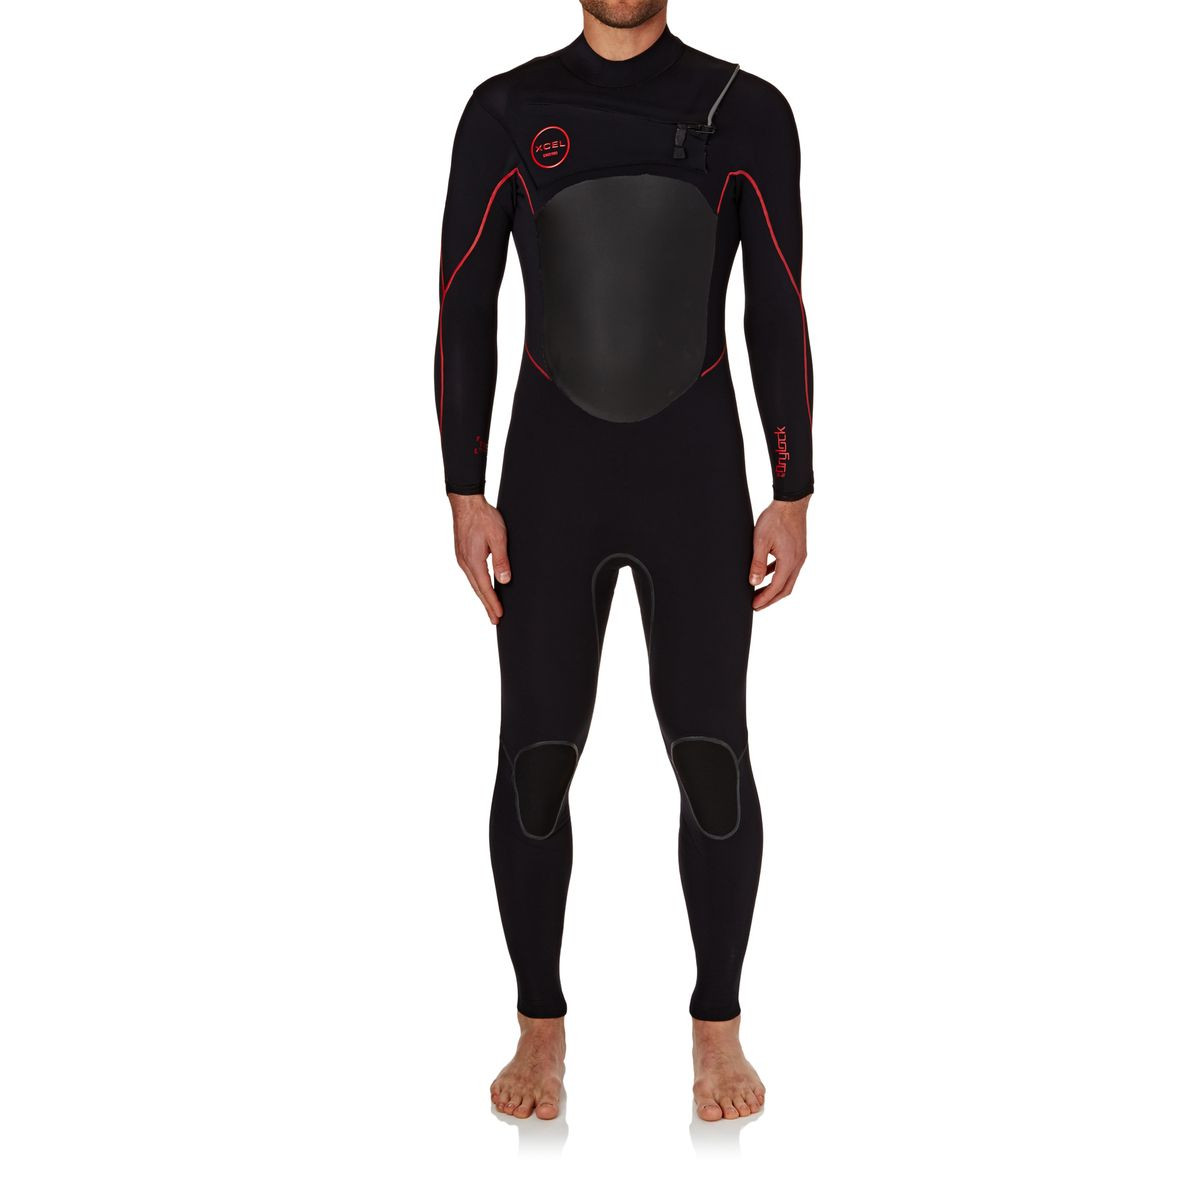 Xcel Drylock 3/2mm TDC 2017 Chest Zip Wetsuit - Black